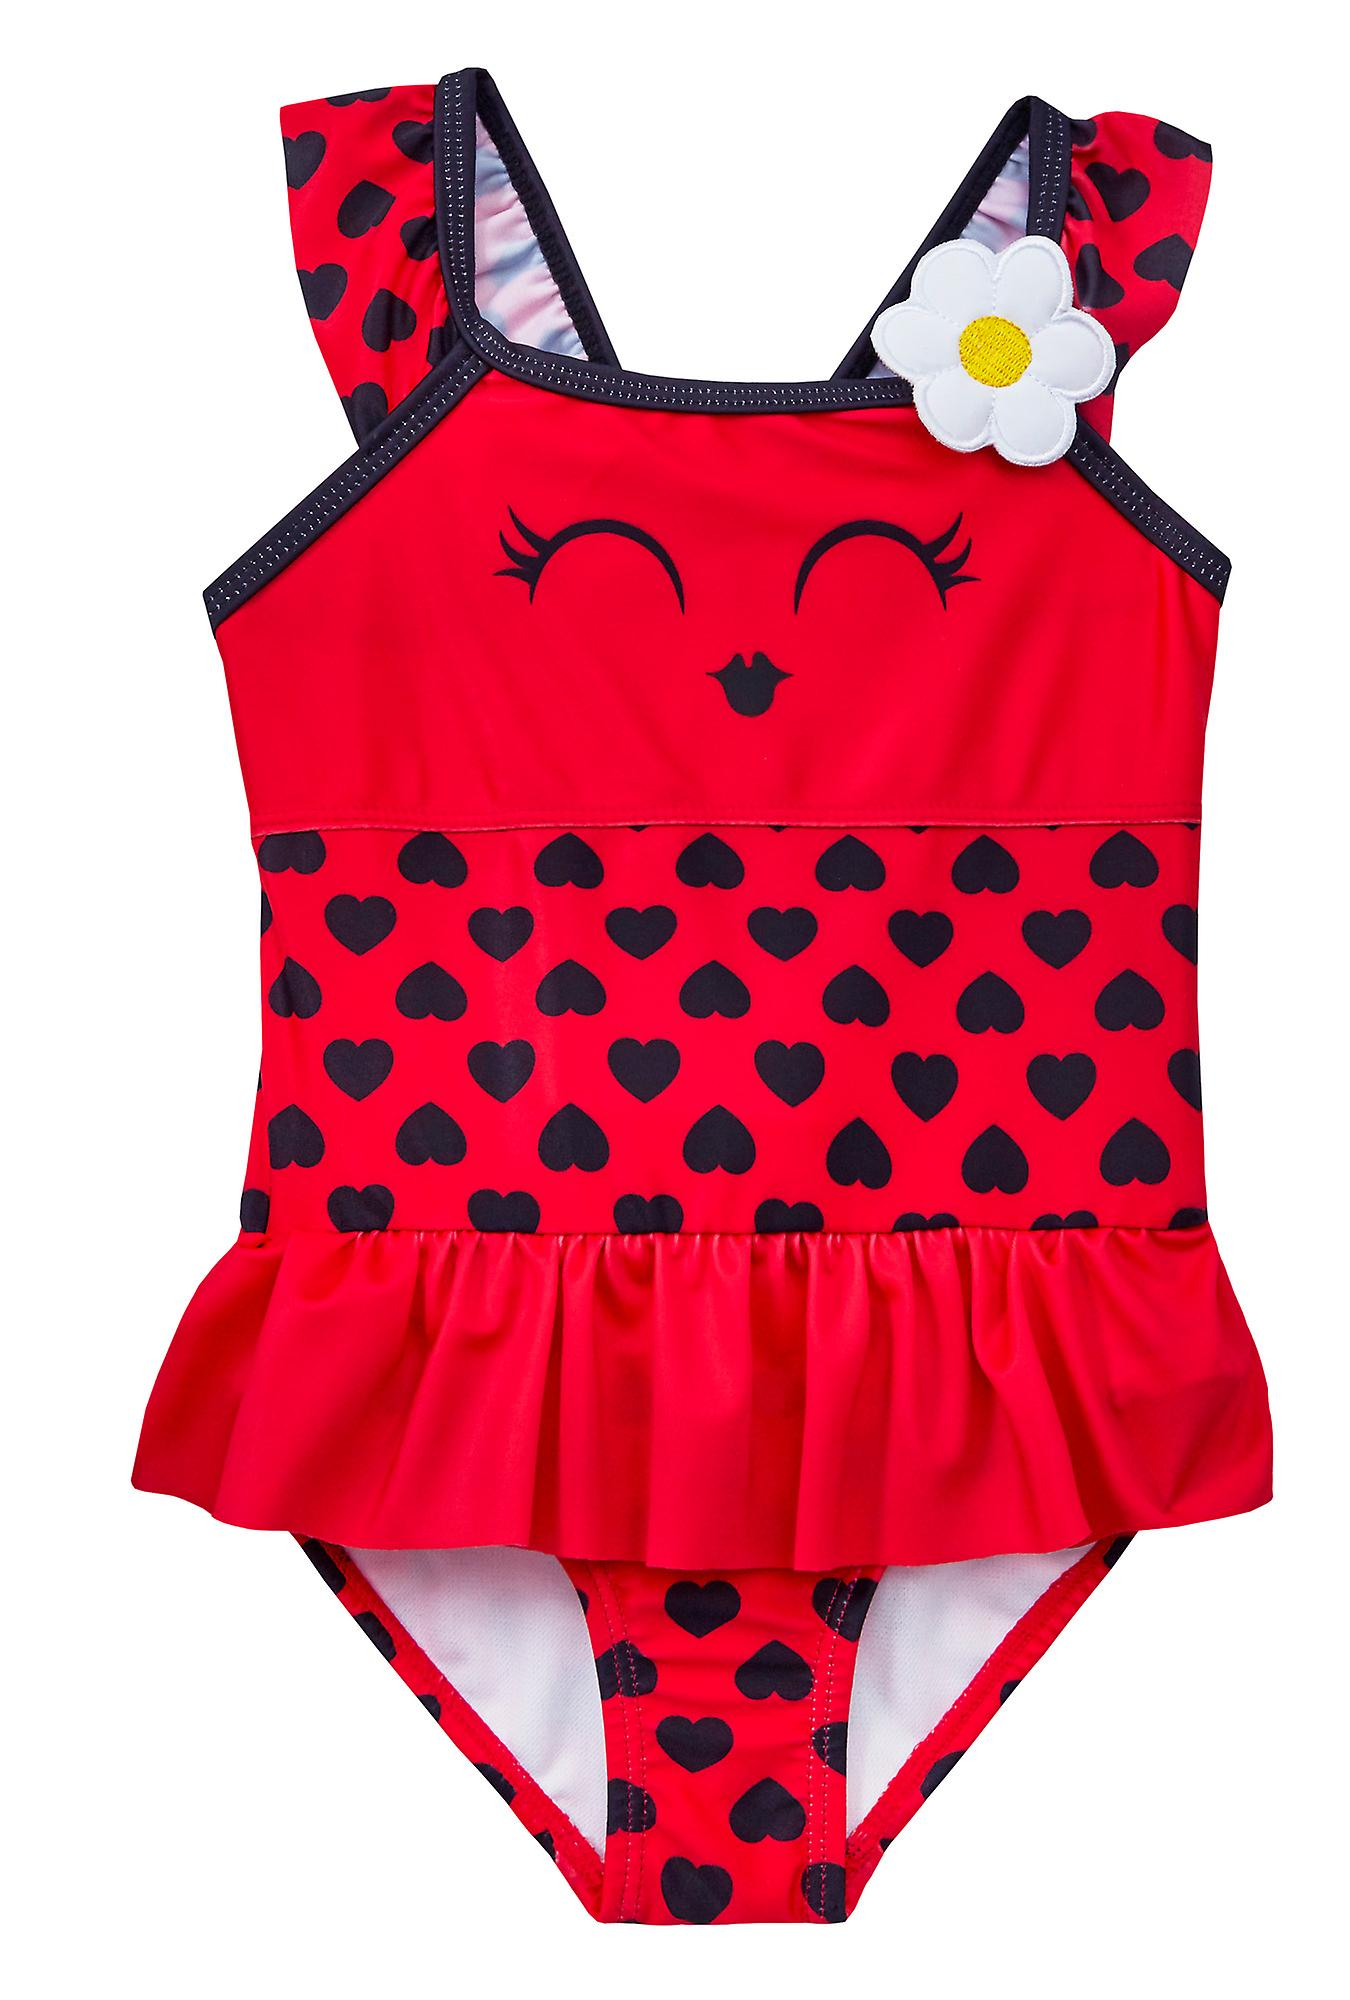 Girls red novelty ladybird swimming costume